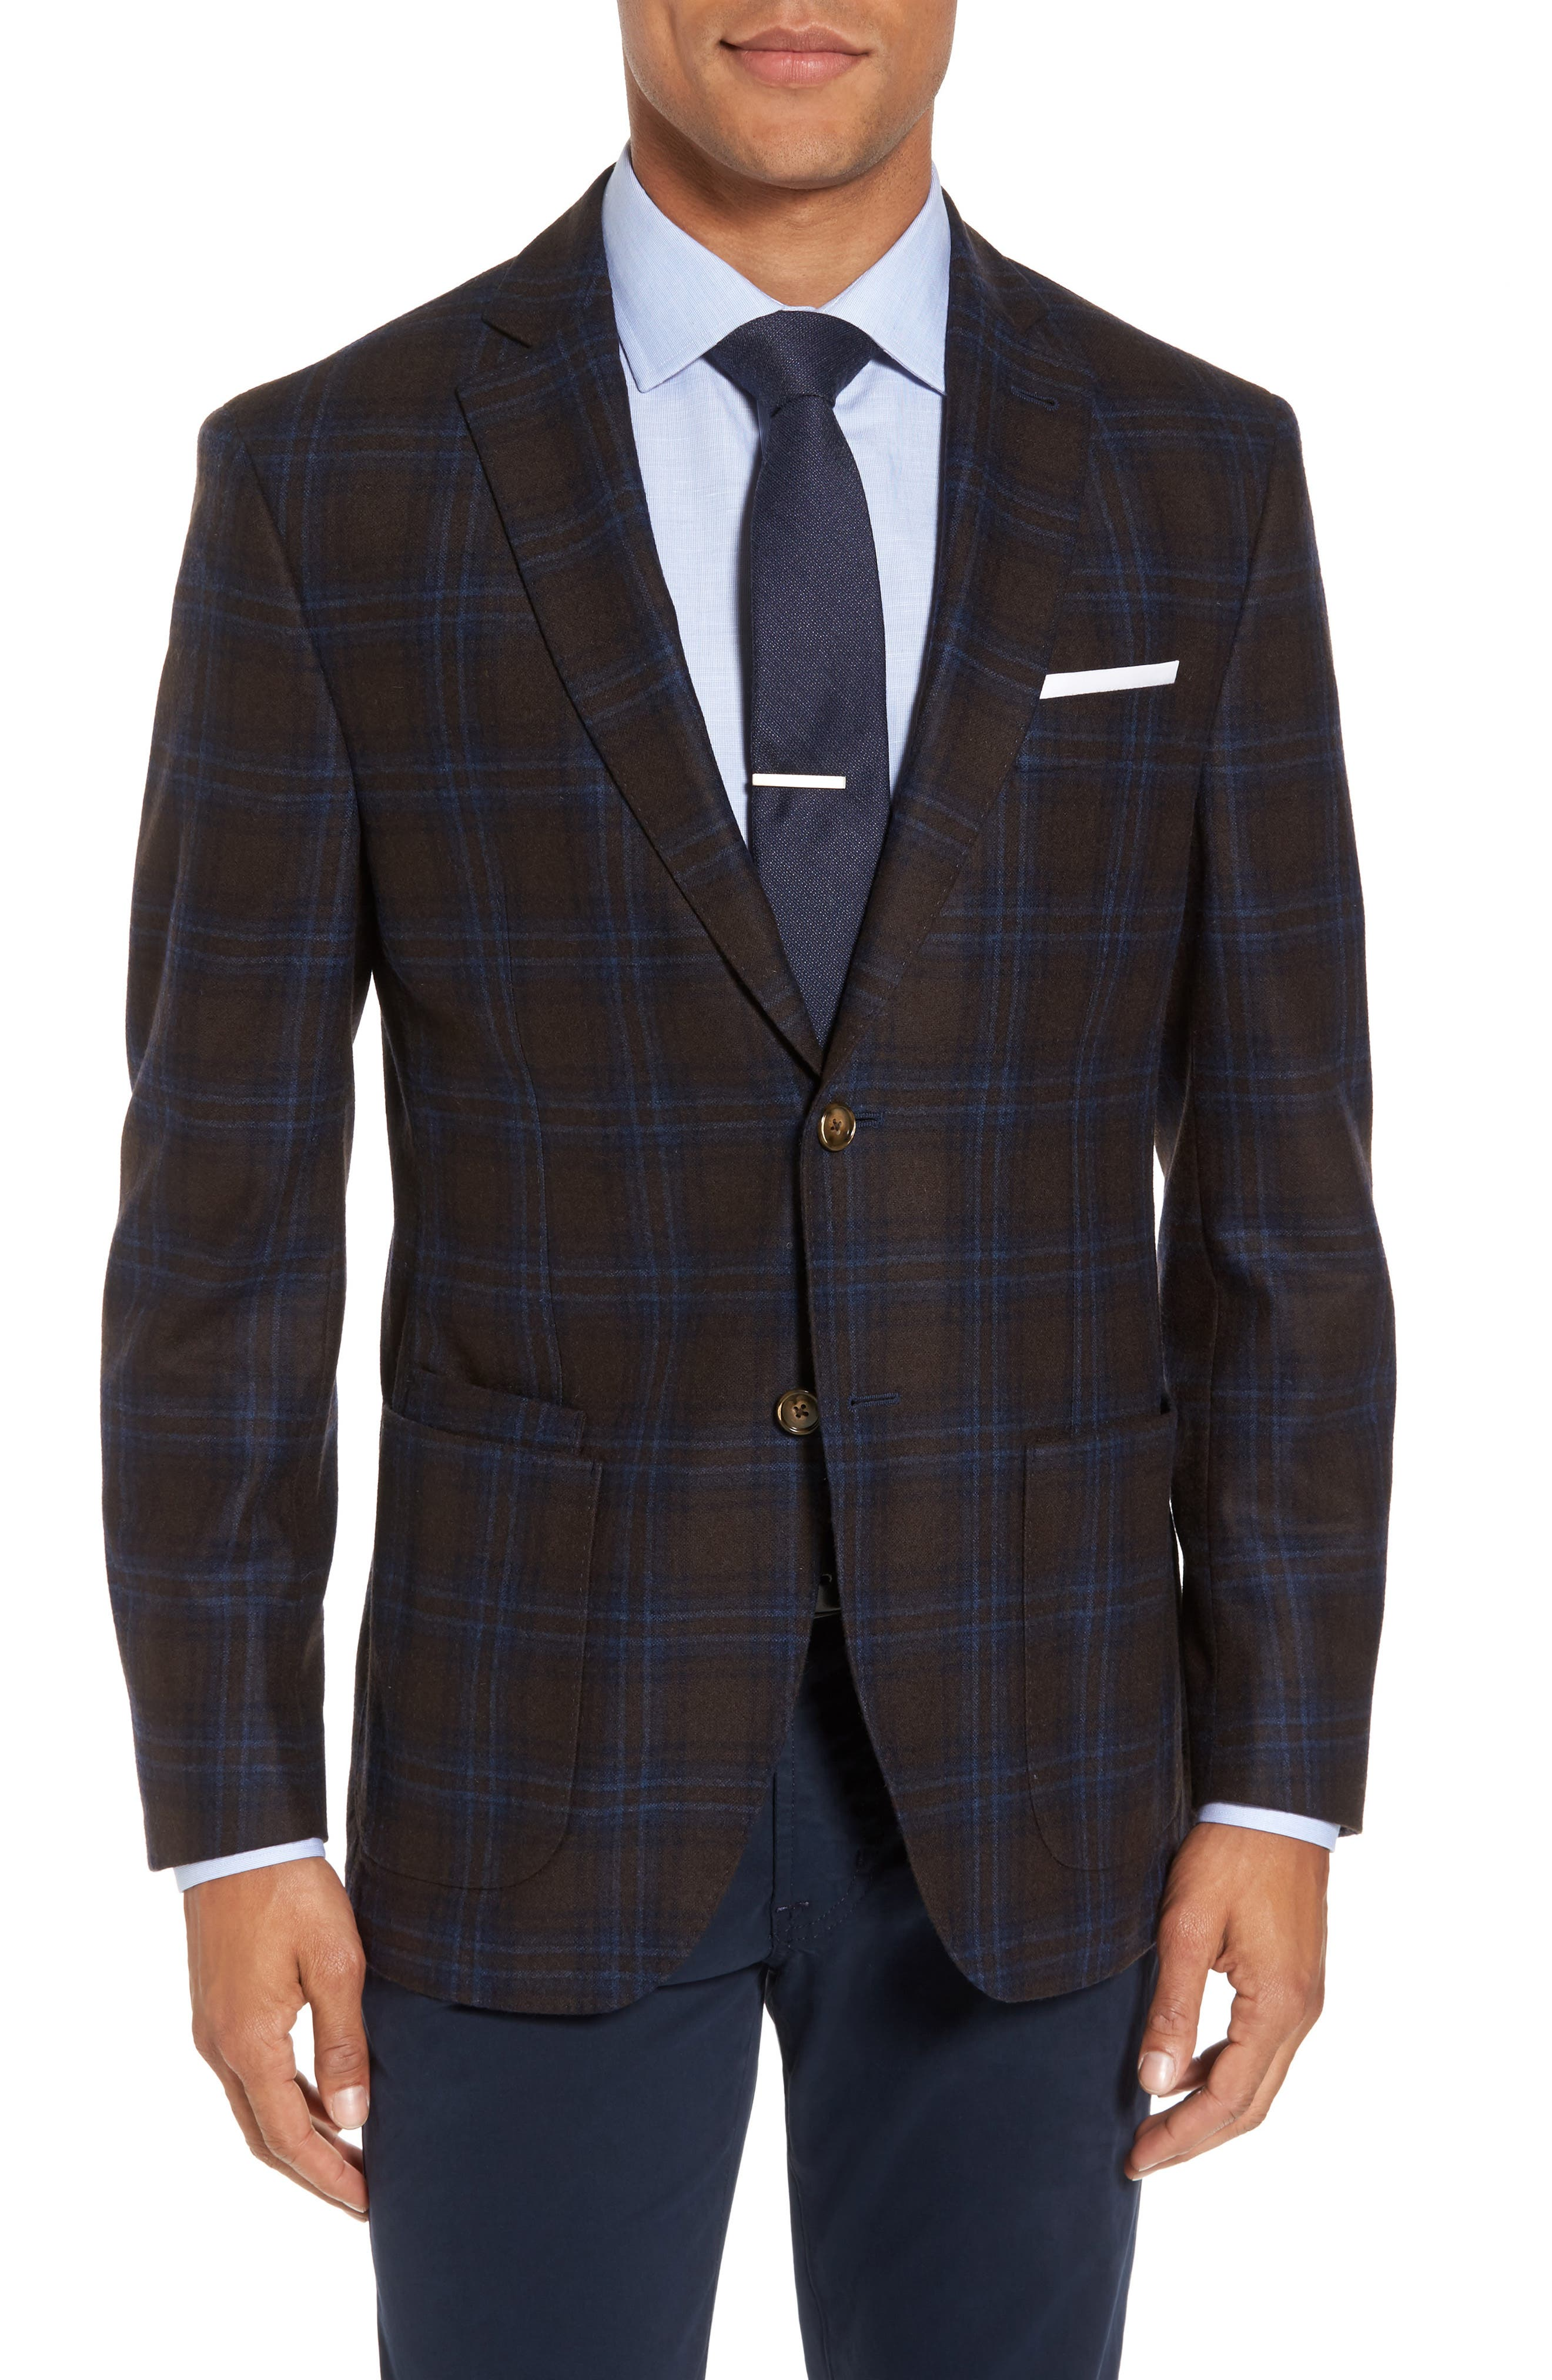 Alternate Image 1 Selected - JKT New York Trim Fit Plaid Wool Blend Sport Coat